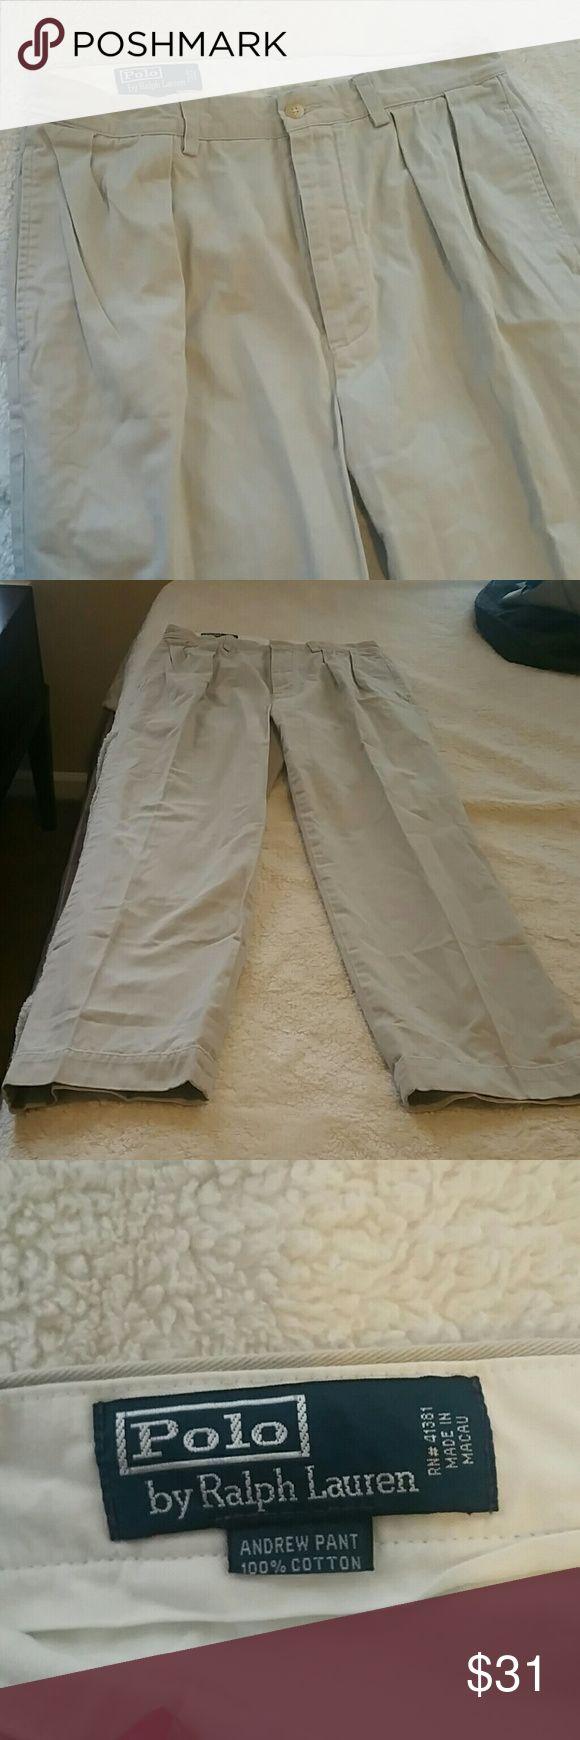 Polo Ralph Lauren Andrew Pant Khaki Trousers Chino --Like New Andrew Pant --Polo by Ralph Lauren  --Khaki Trousers  --Labels shown in photo Polo by Ralph Lauren Pants Chinos & Khakis